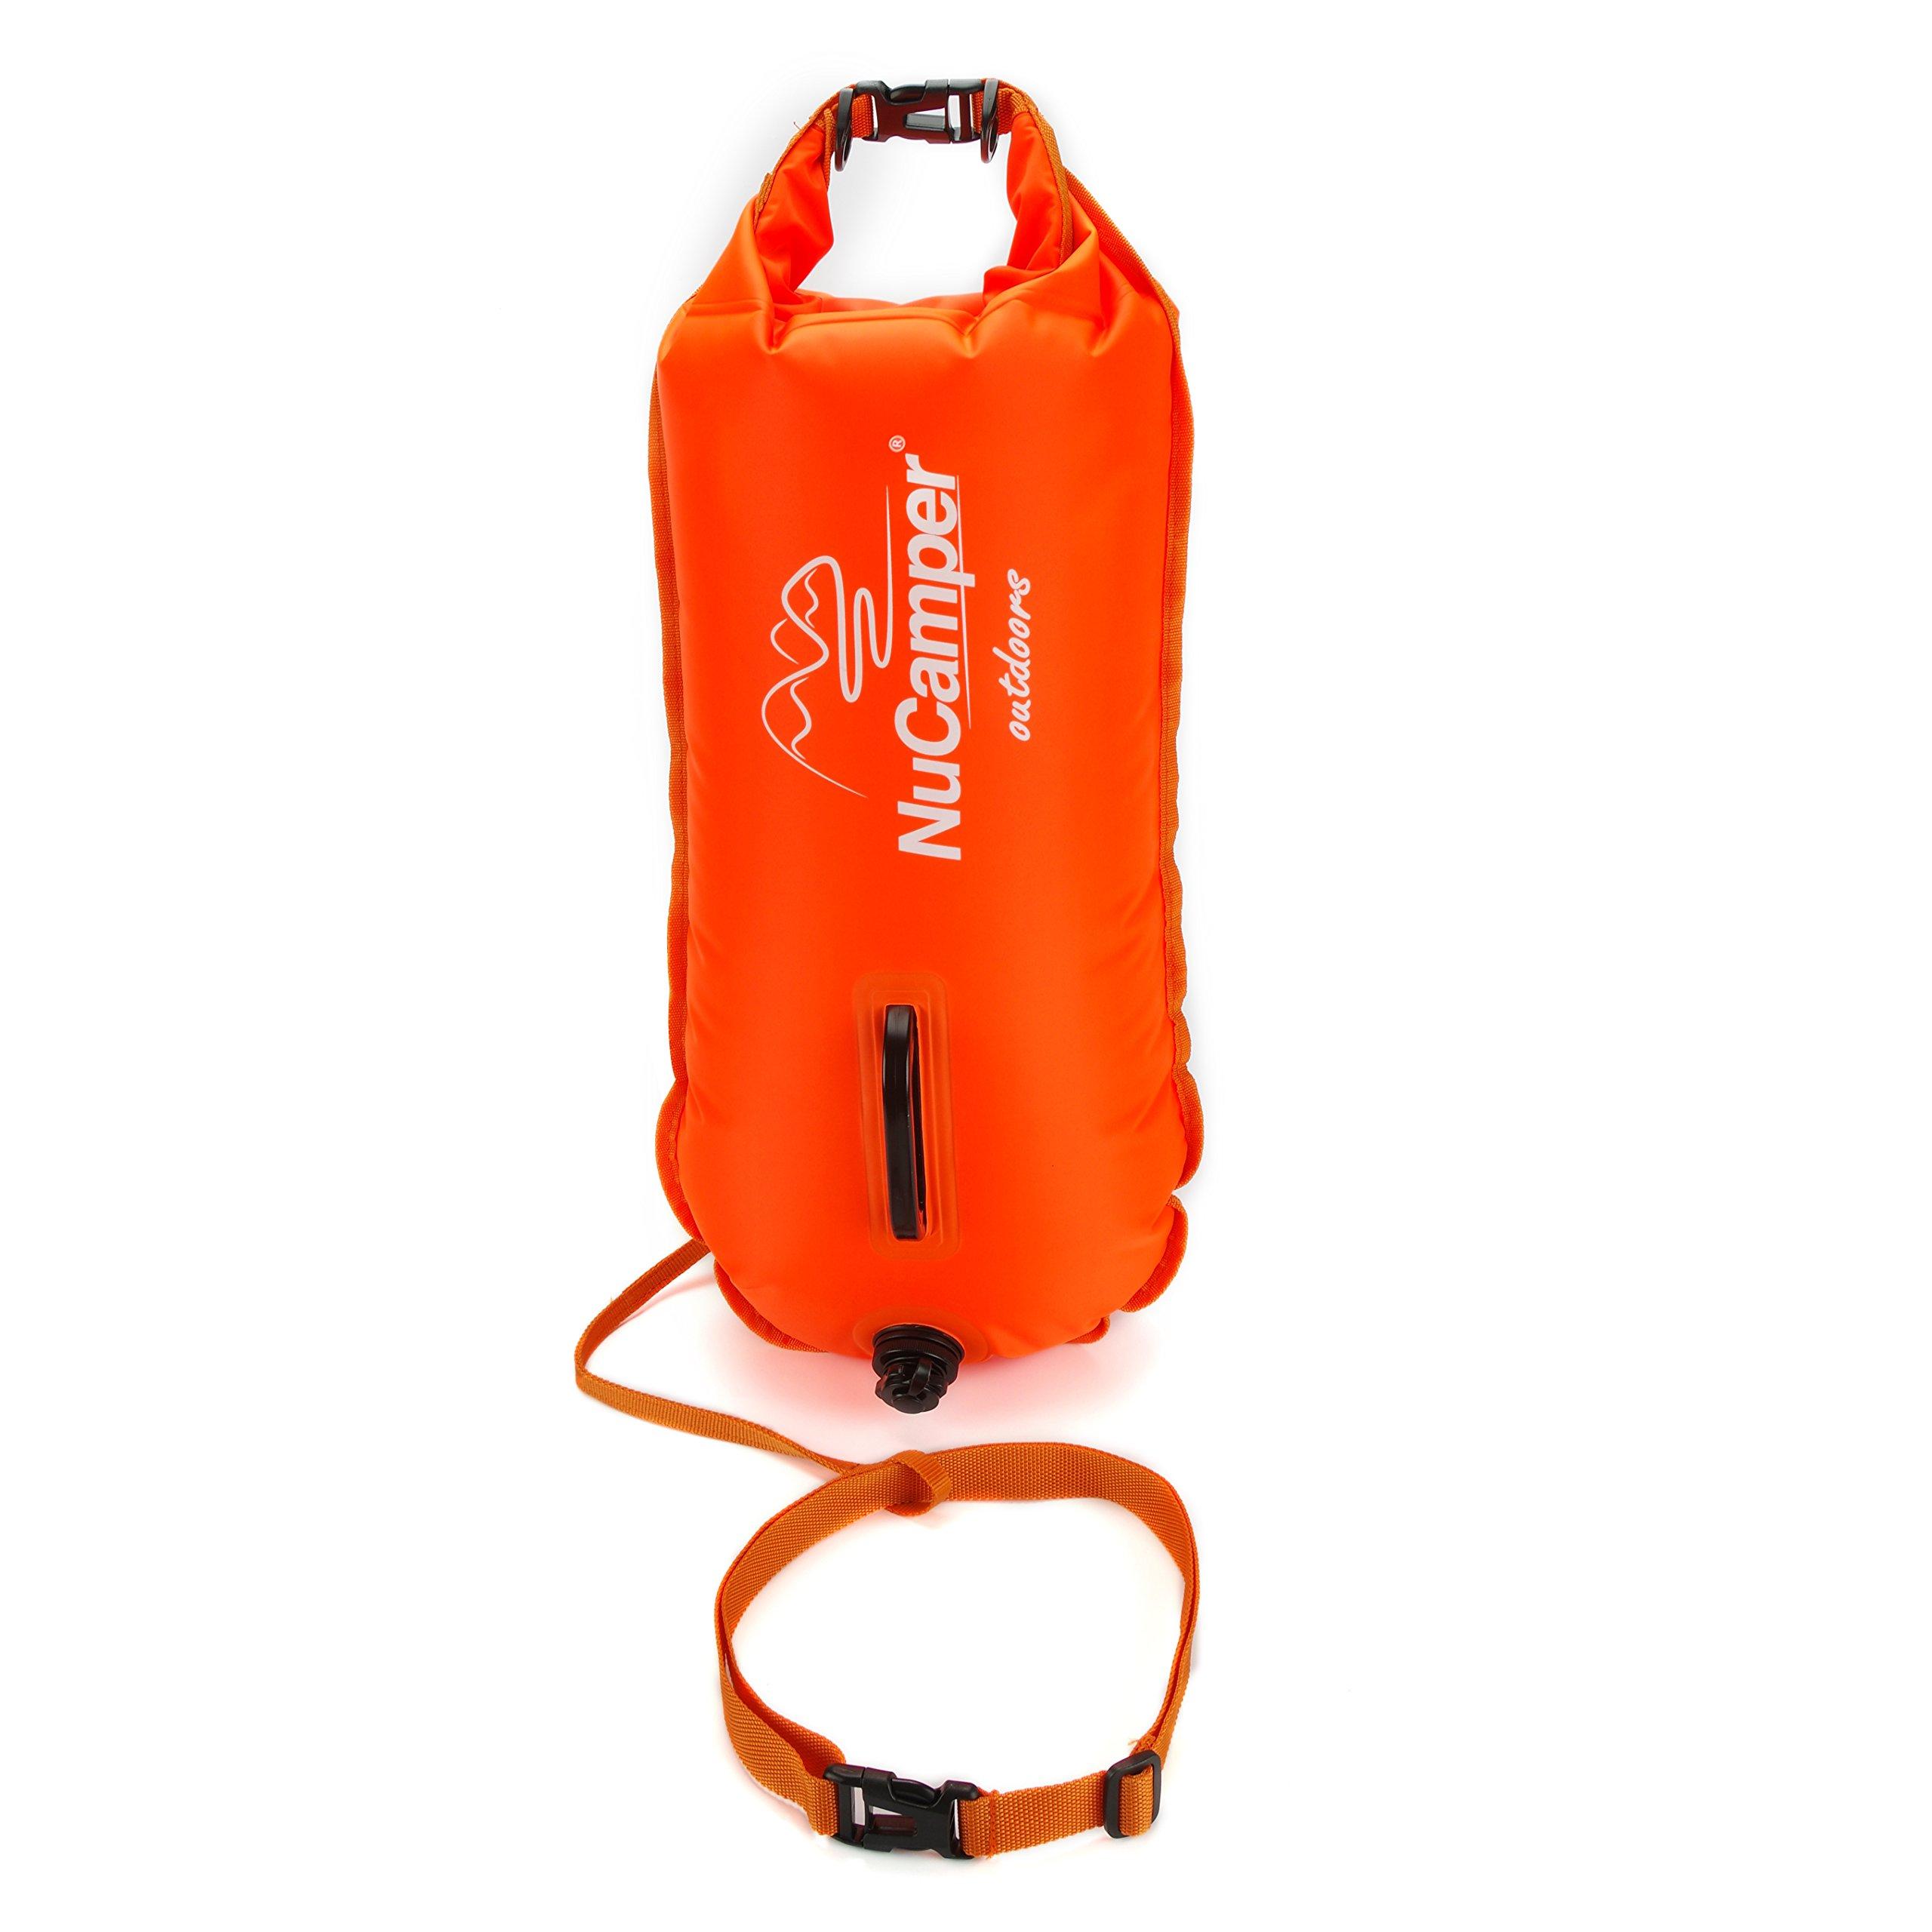 NuCamper 28L Inflatable Swim Buoy Waterproof Floating Drybag for Safe Swimming, Snorkeling, Kayaking, Water Diving, Training